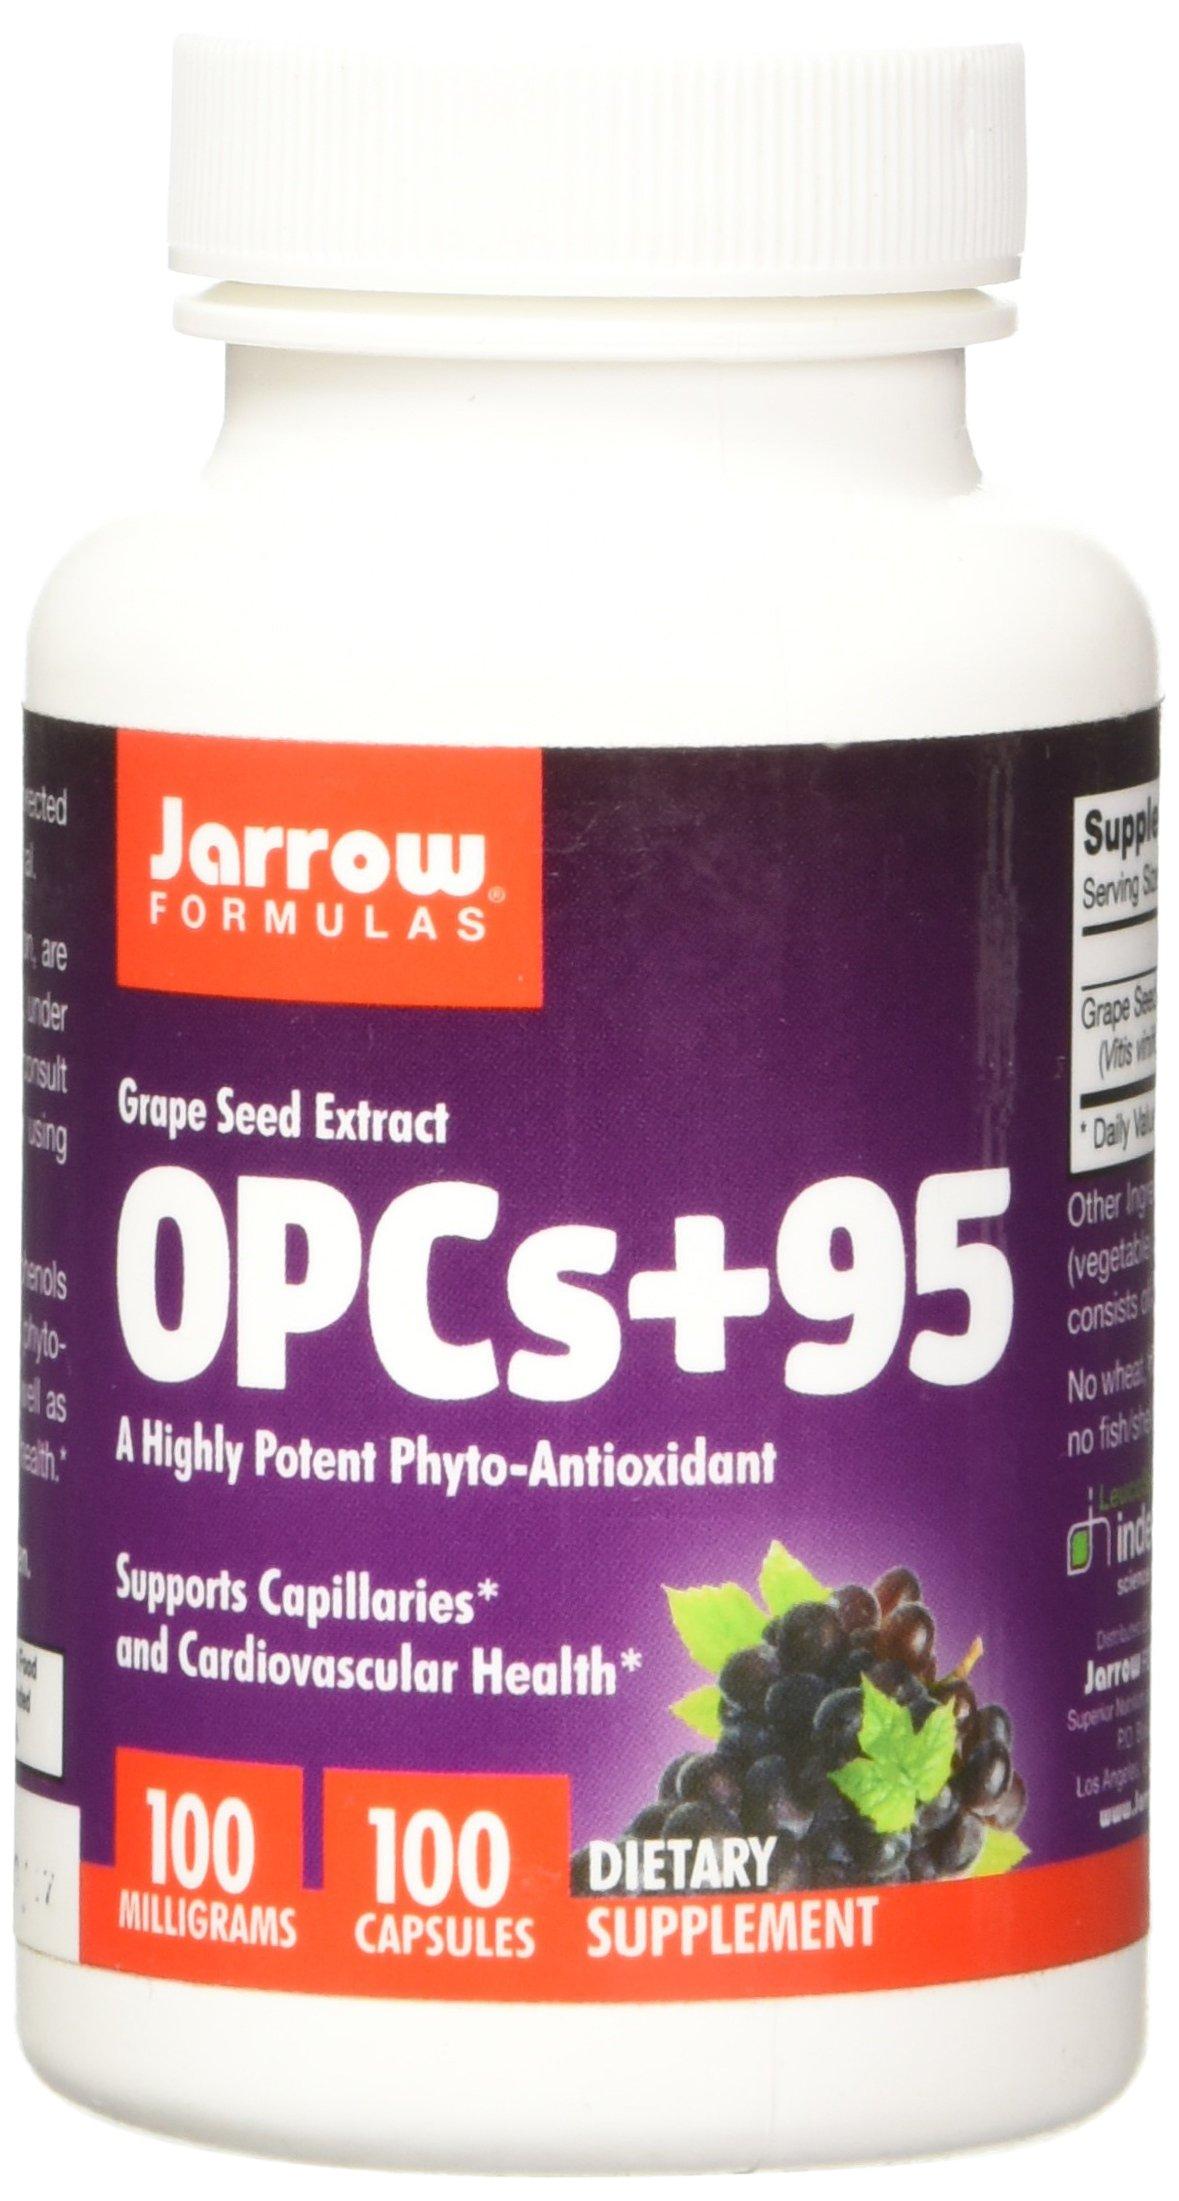 Jarrow Formulas OPCs + 95 100 mg, Suports Cardiovascular Health, 100 mg, 100 Caps